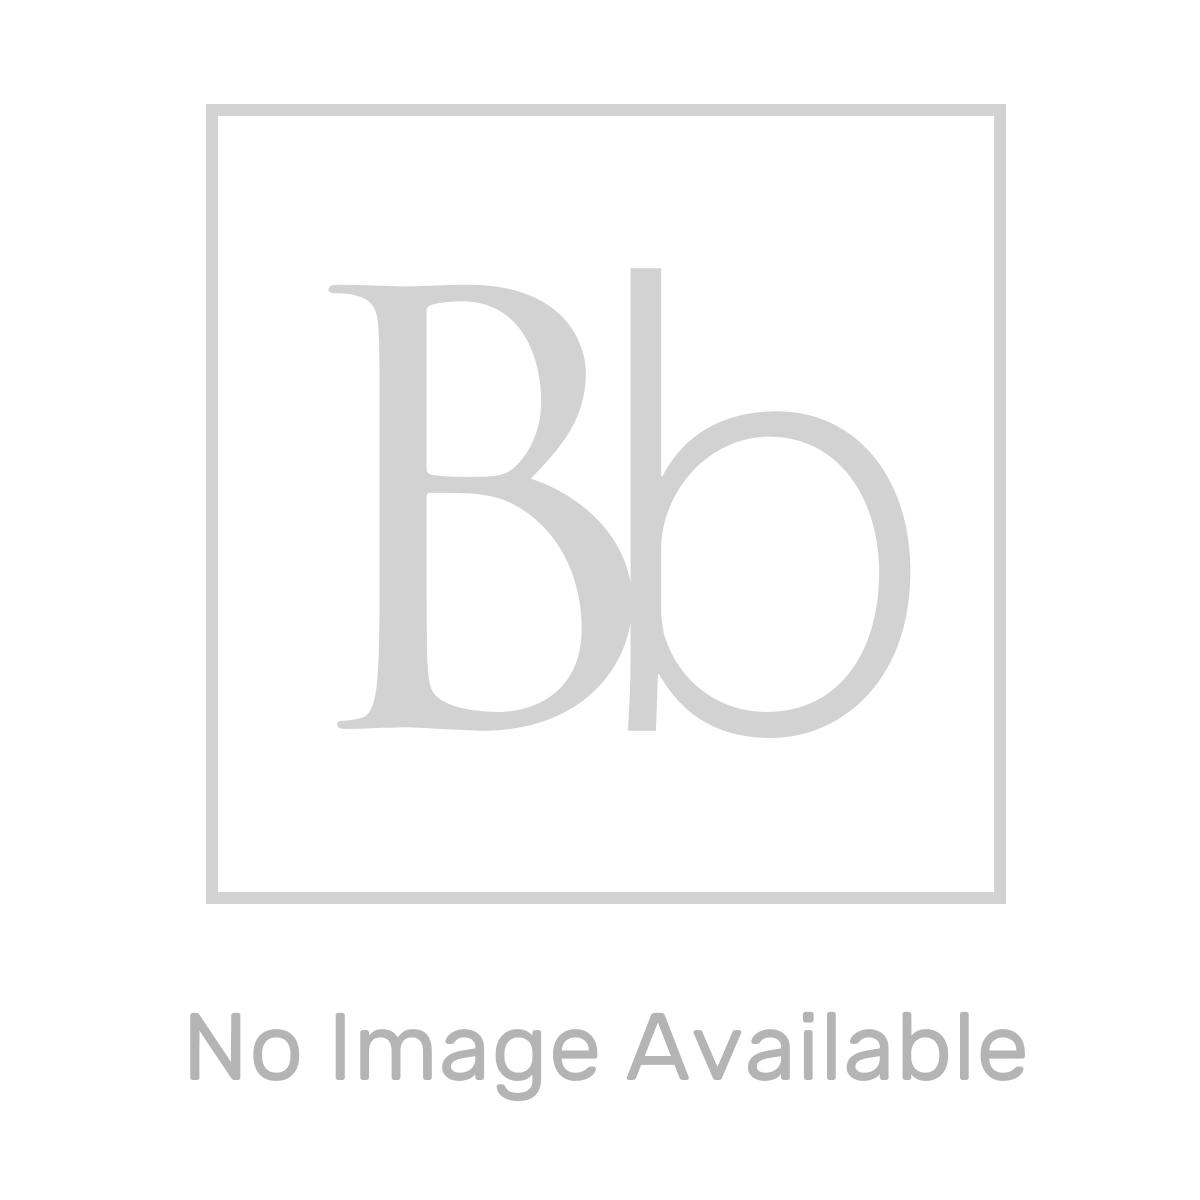 Aquadart Black Slate Shower Tray 1700 x 800 Dimension